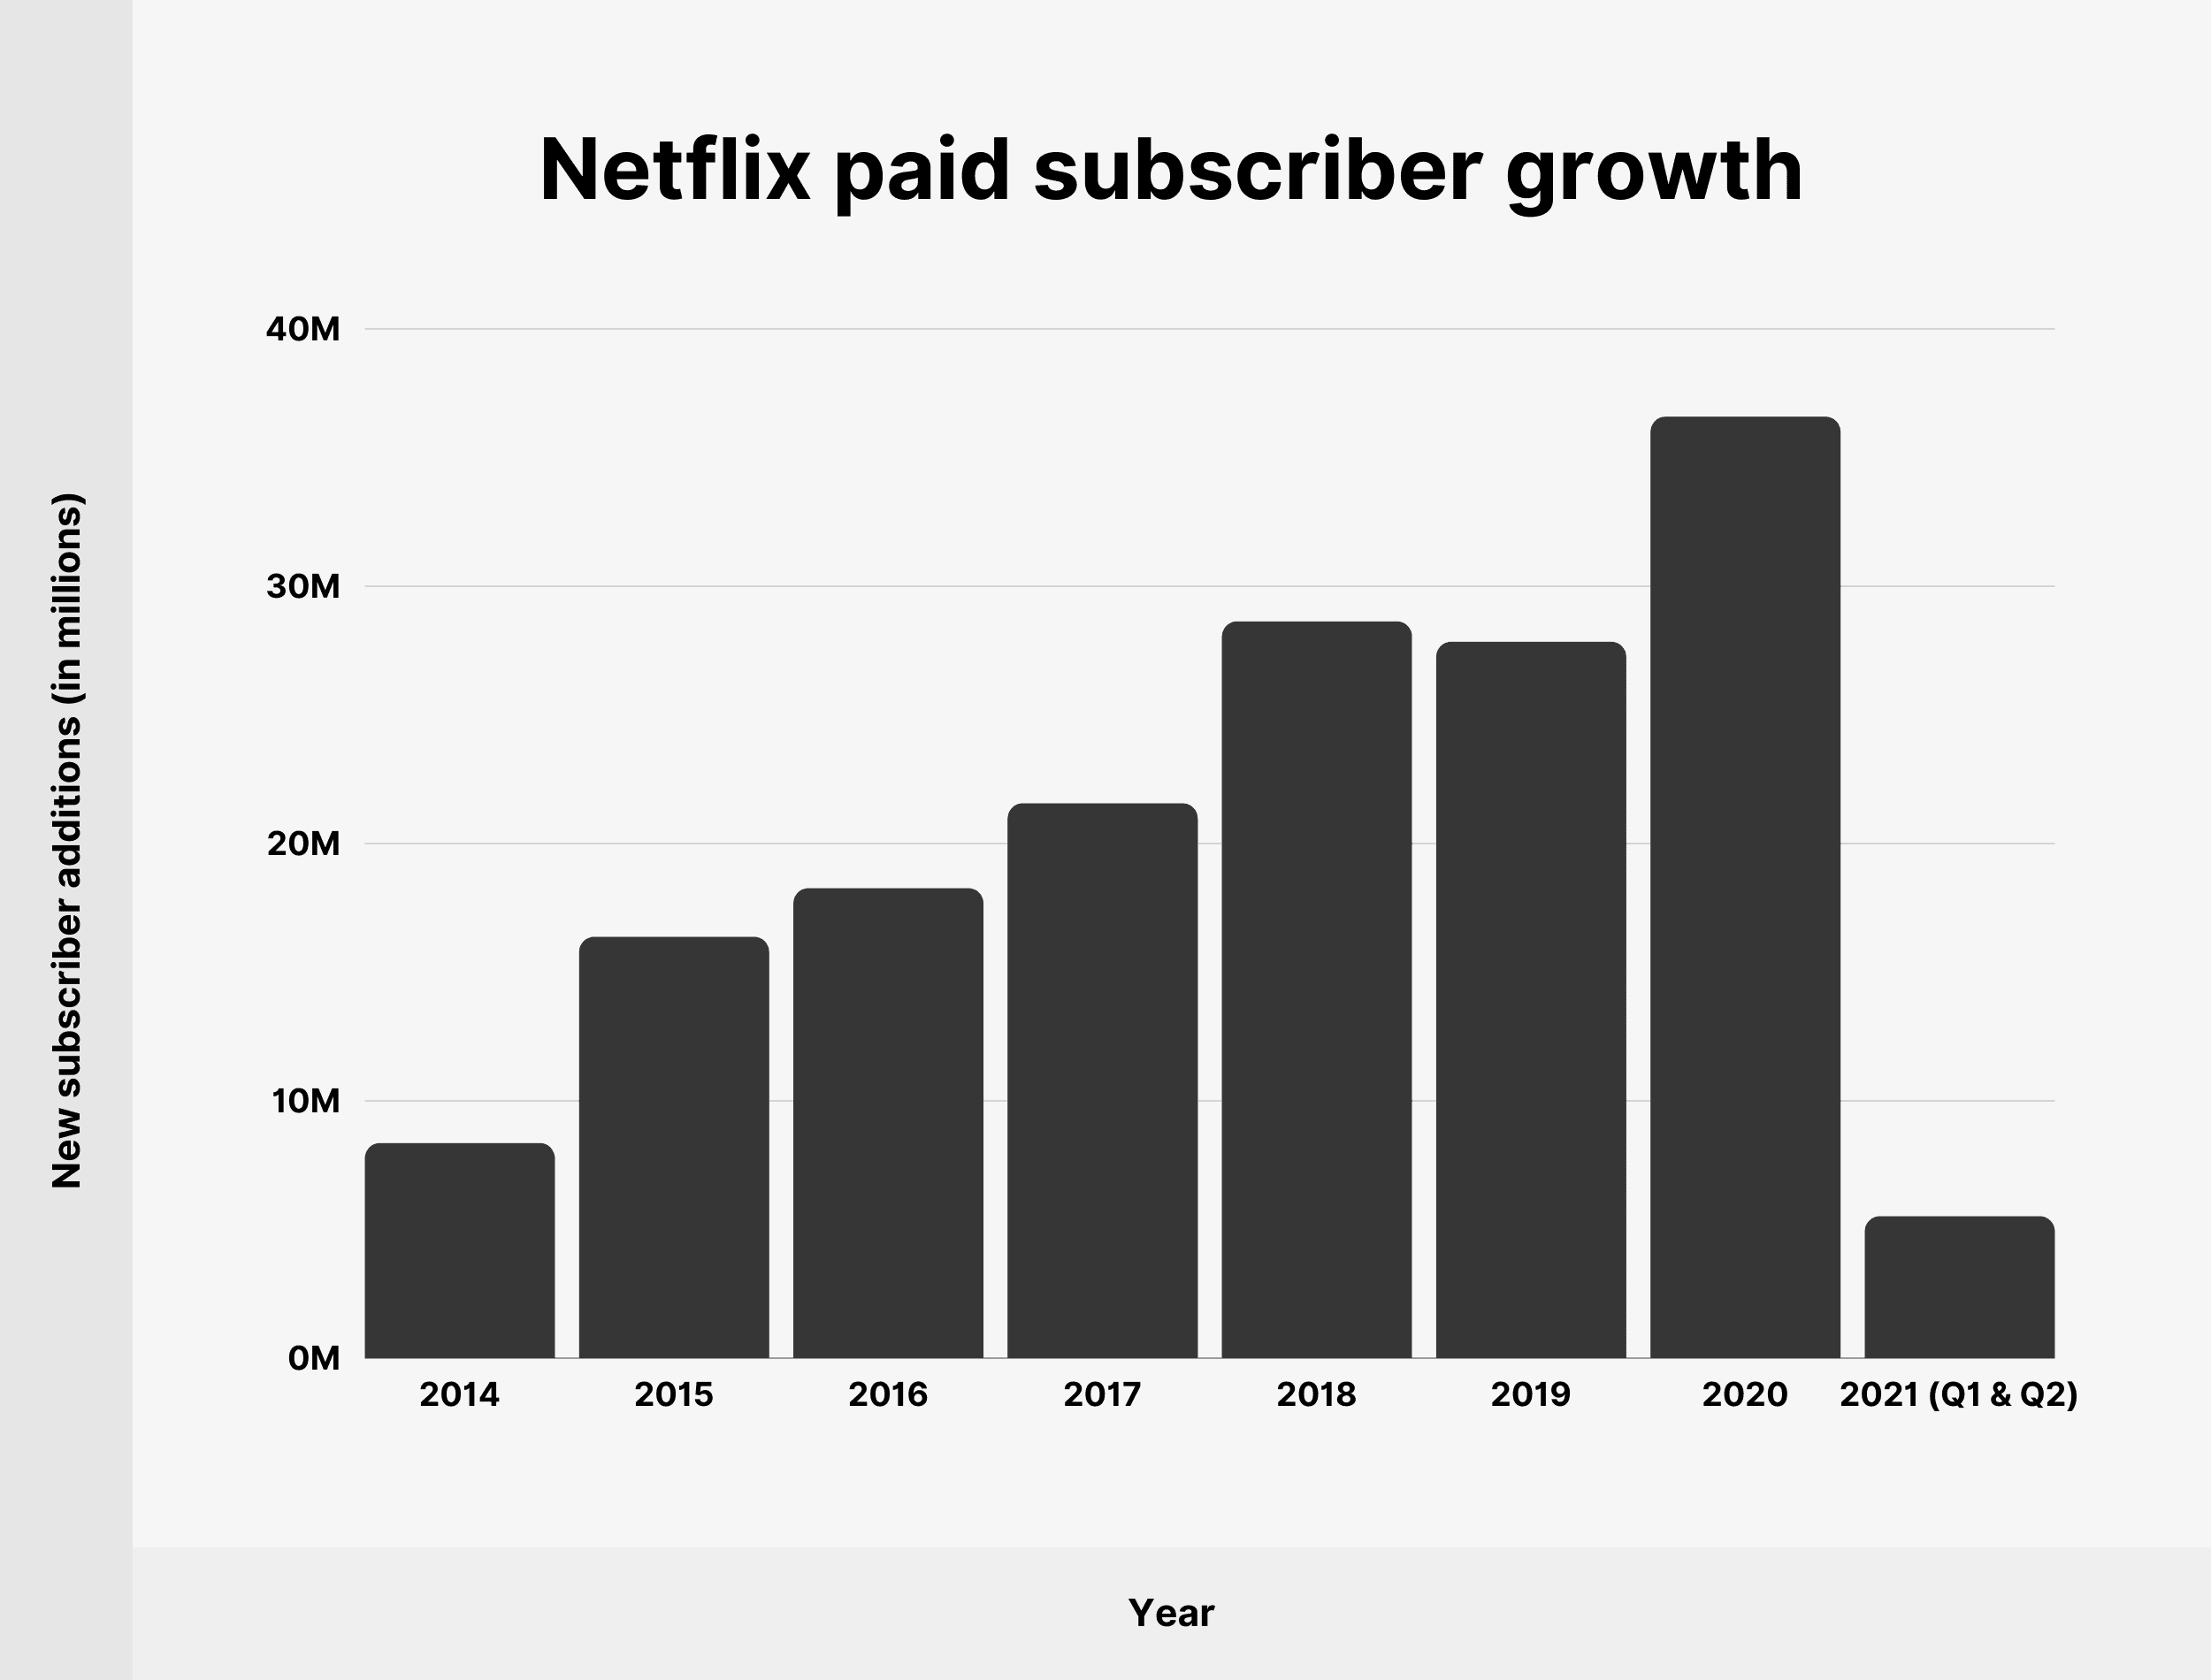 Netflix paid subscriber growth